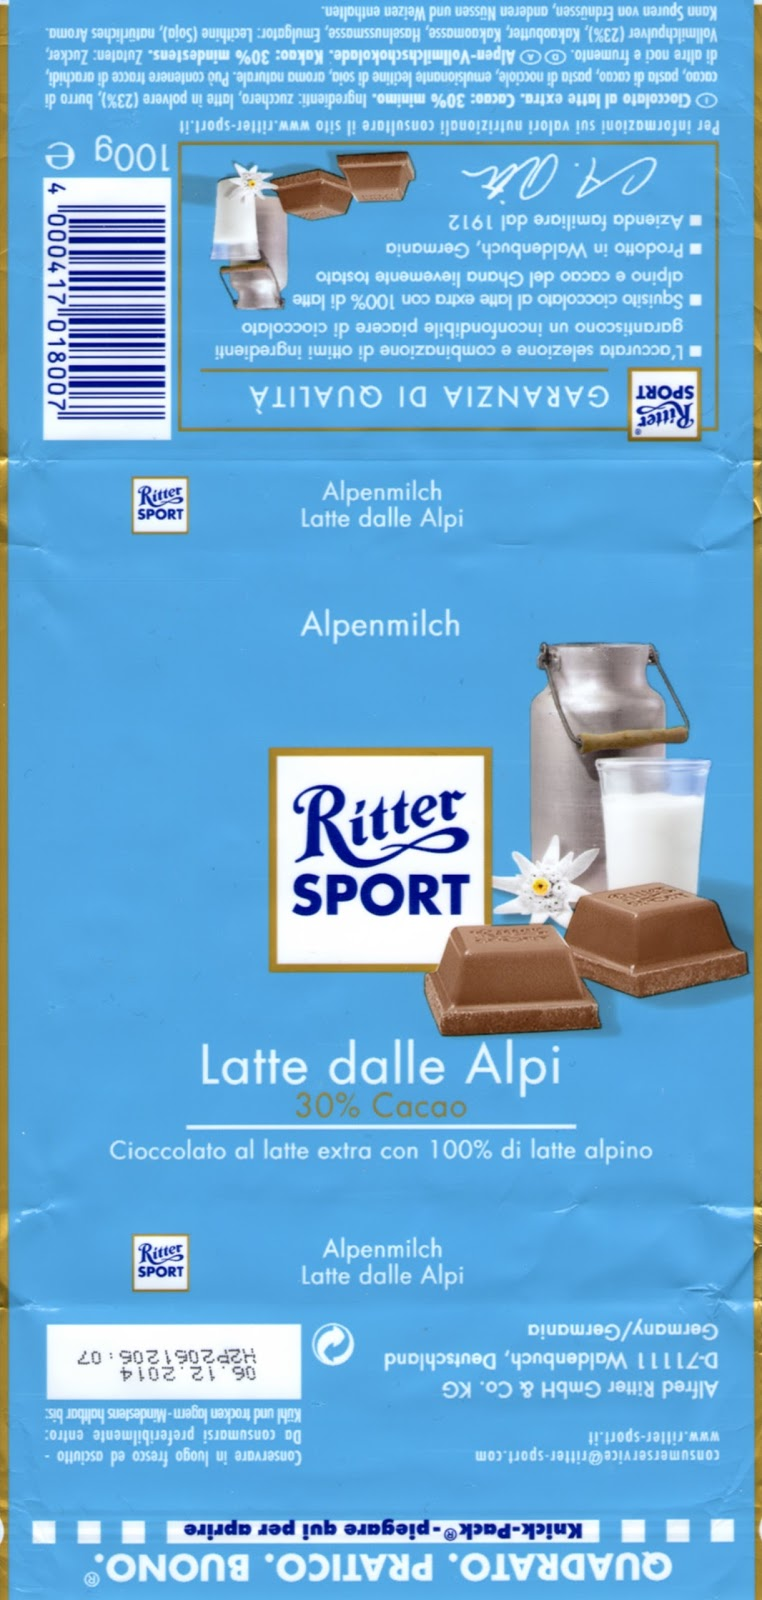 Ritter Sport Lait des Alpes version Italienne Ritter Sport Latte dalle Alpi